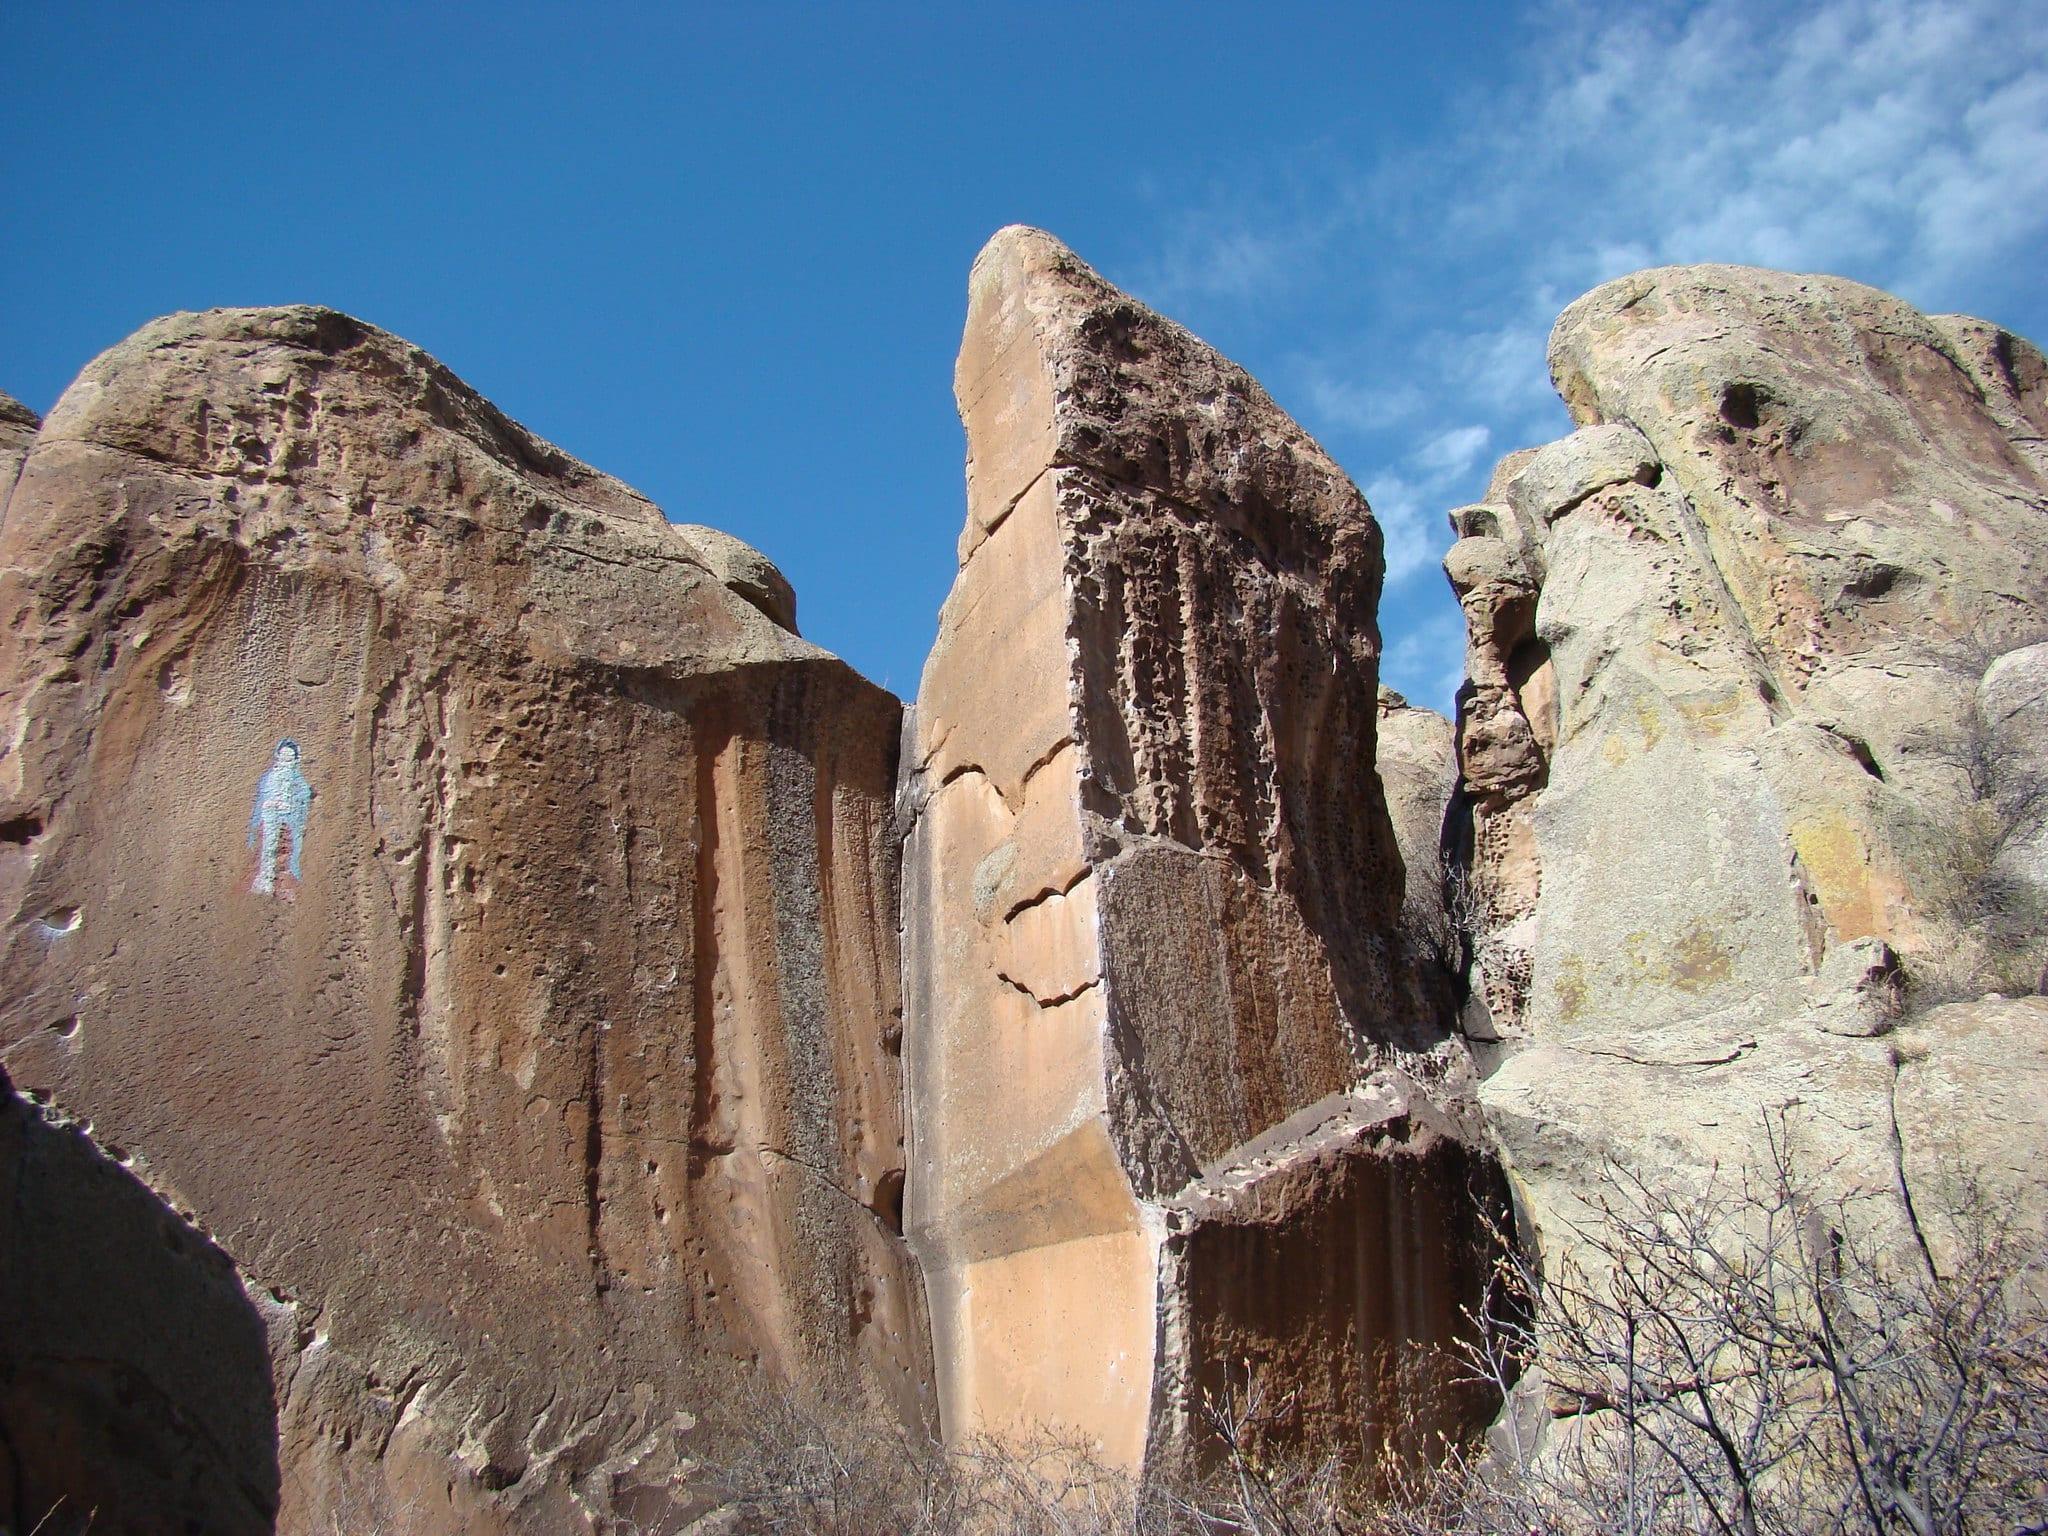 image of pentitente canyon